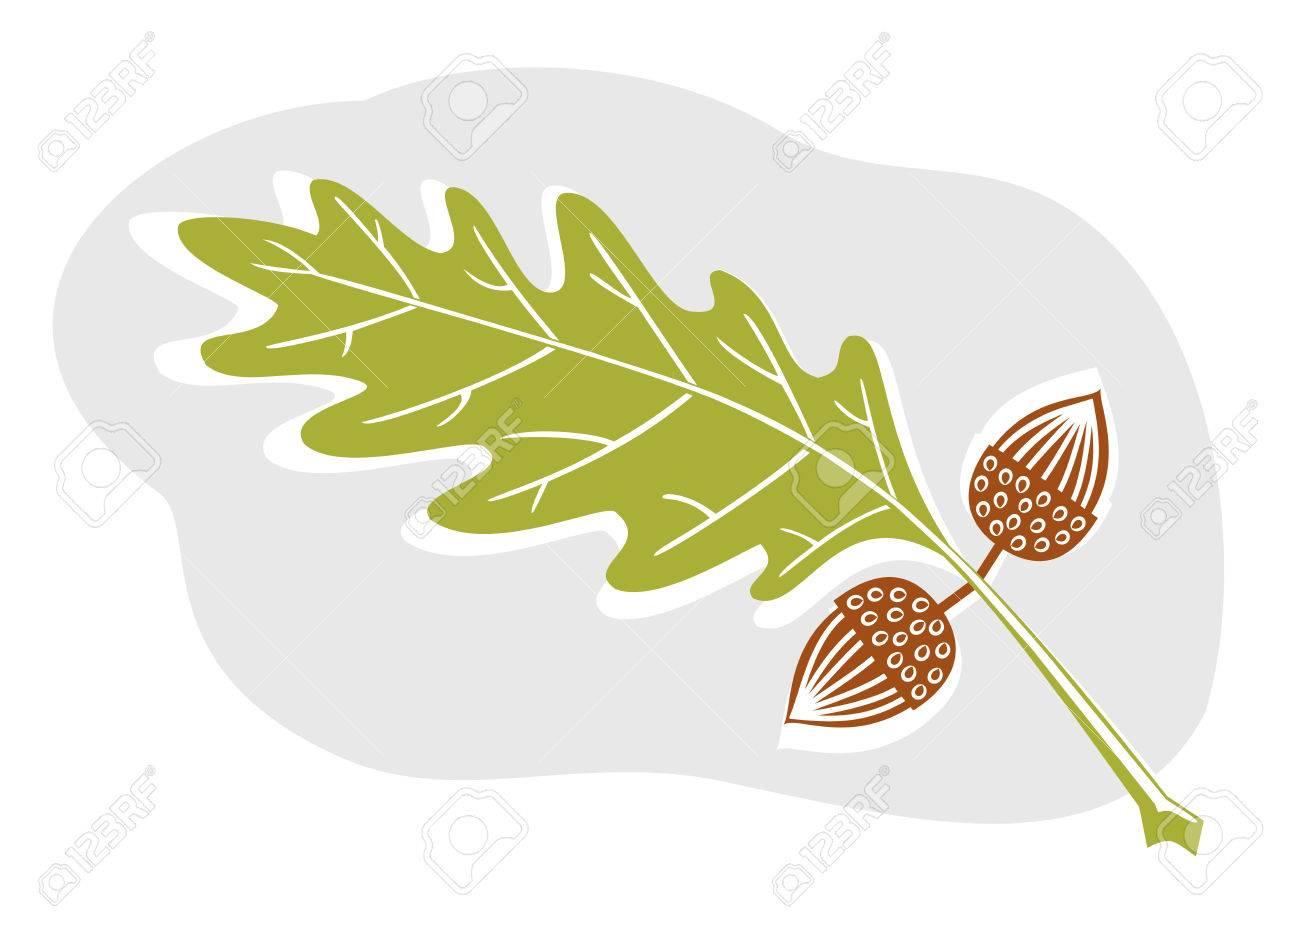 Oak Leaf And Acorn Drawing A sweet acorn and oak leaf